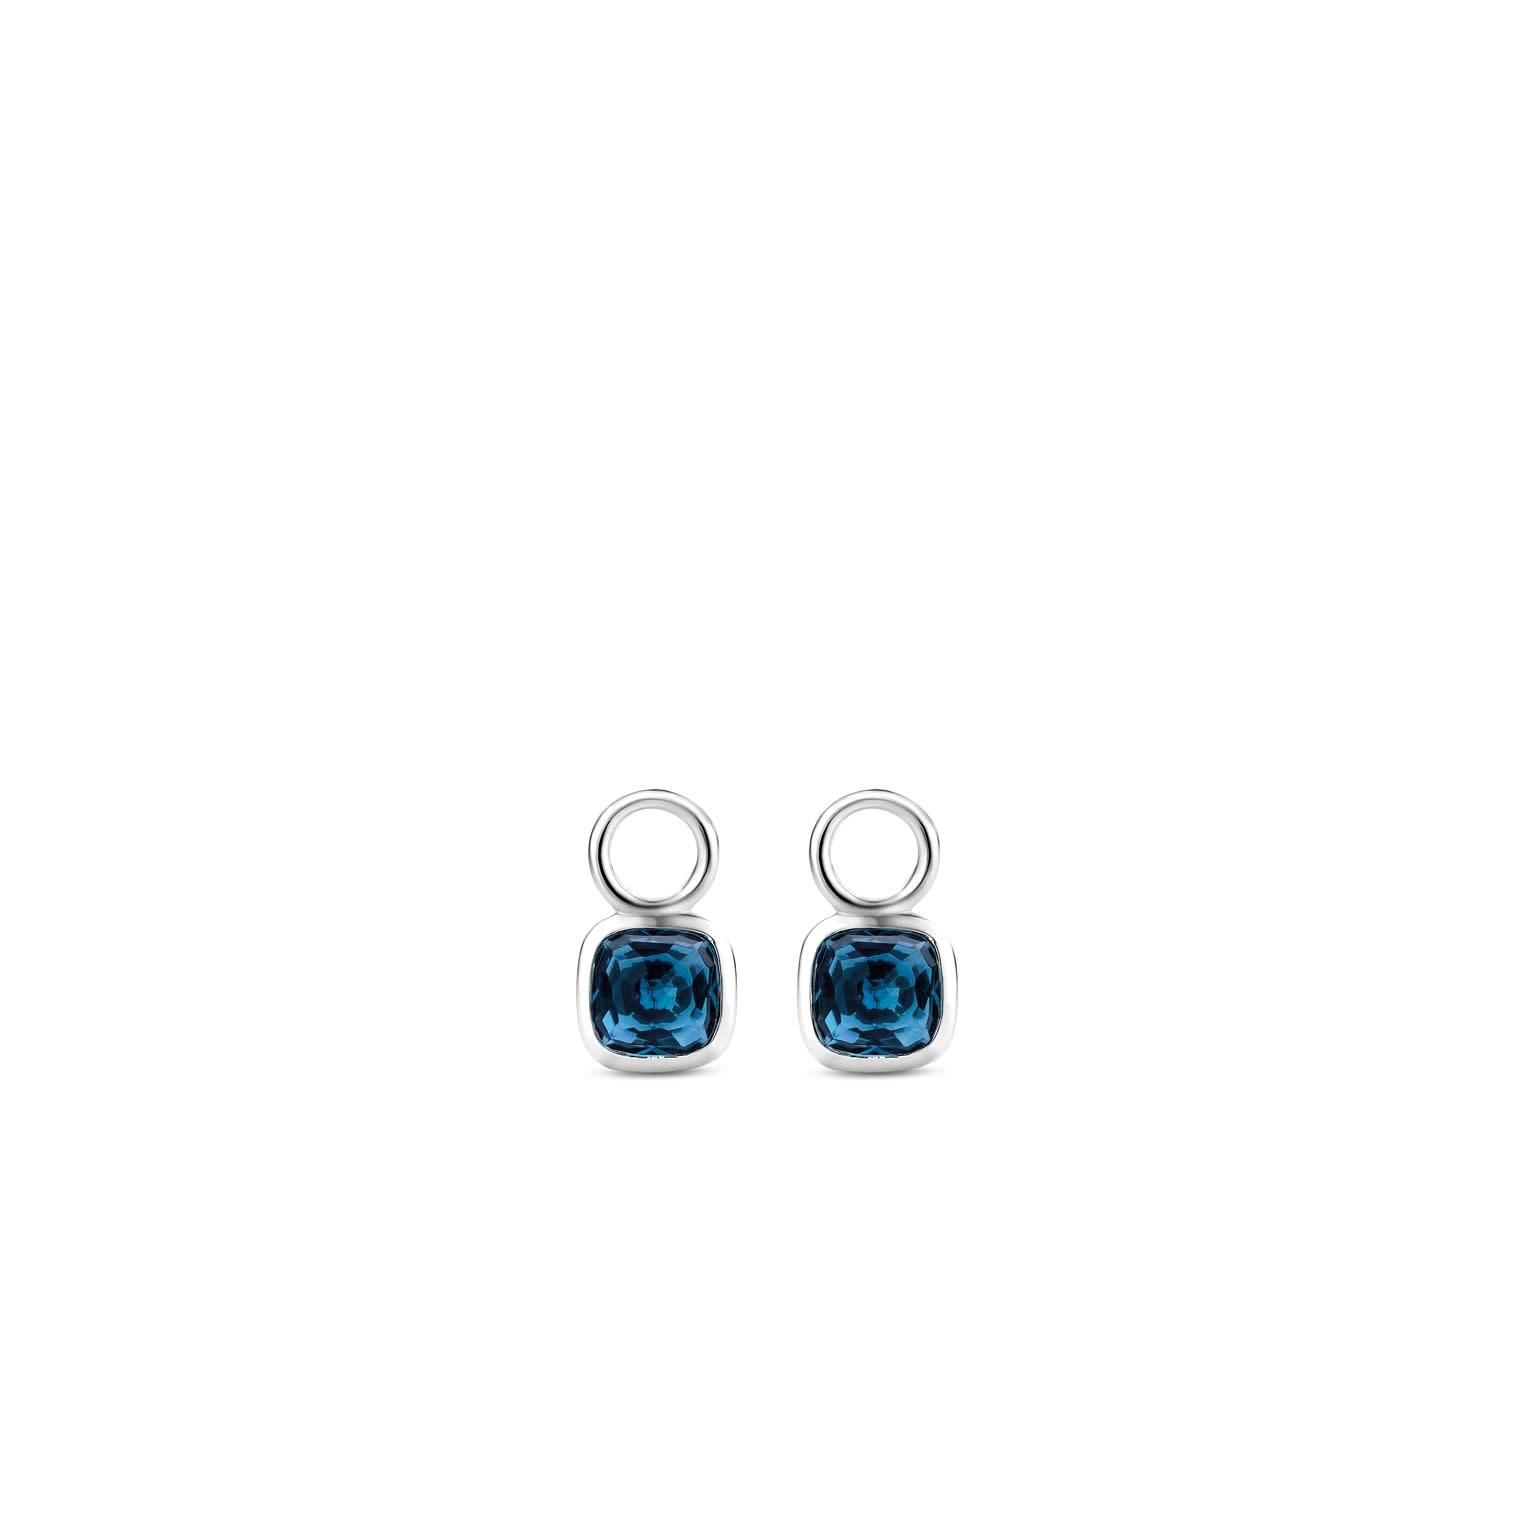 TI SENTO - Milano Ear Charms 9208DB-1